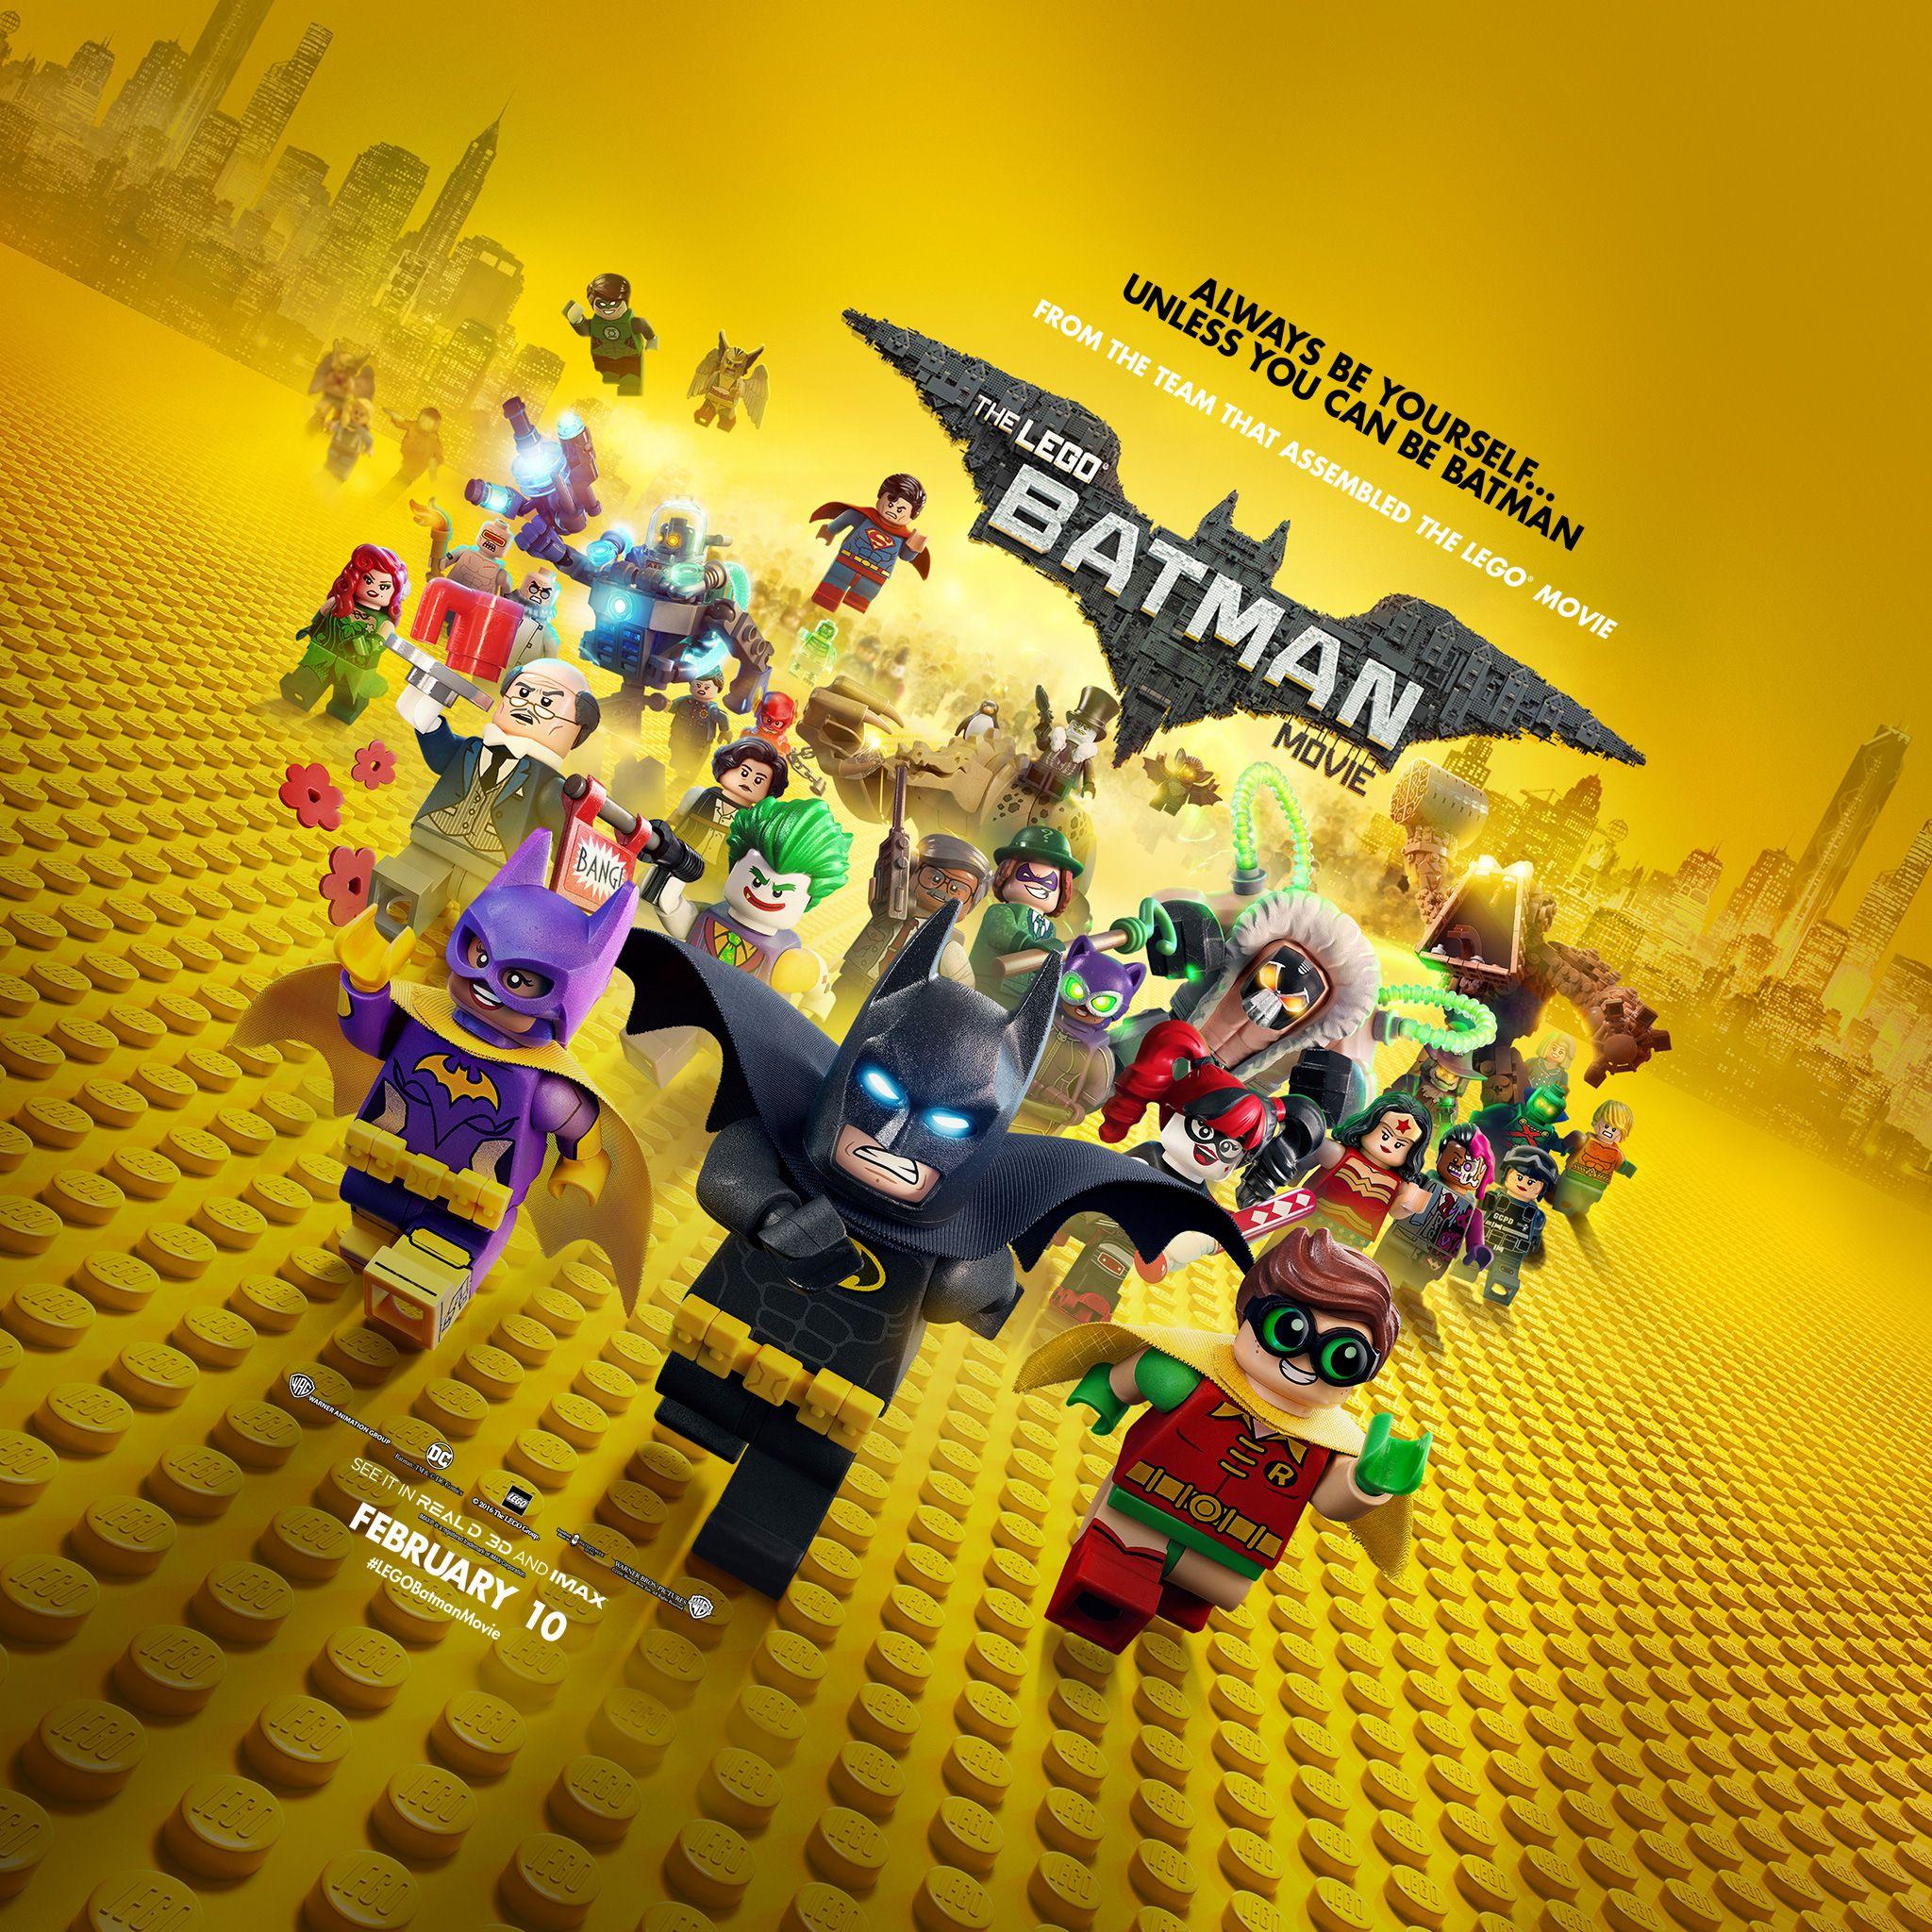 The lego batman movie wallpapers hd backgrounds images pics the lego batman movie wallpapers hd backgrounds images pics voltagebd Image collections